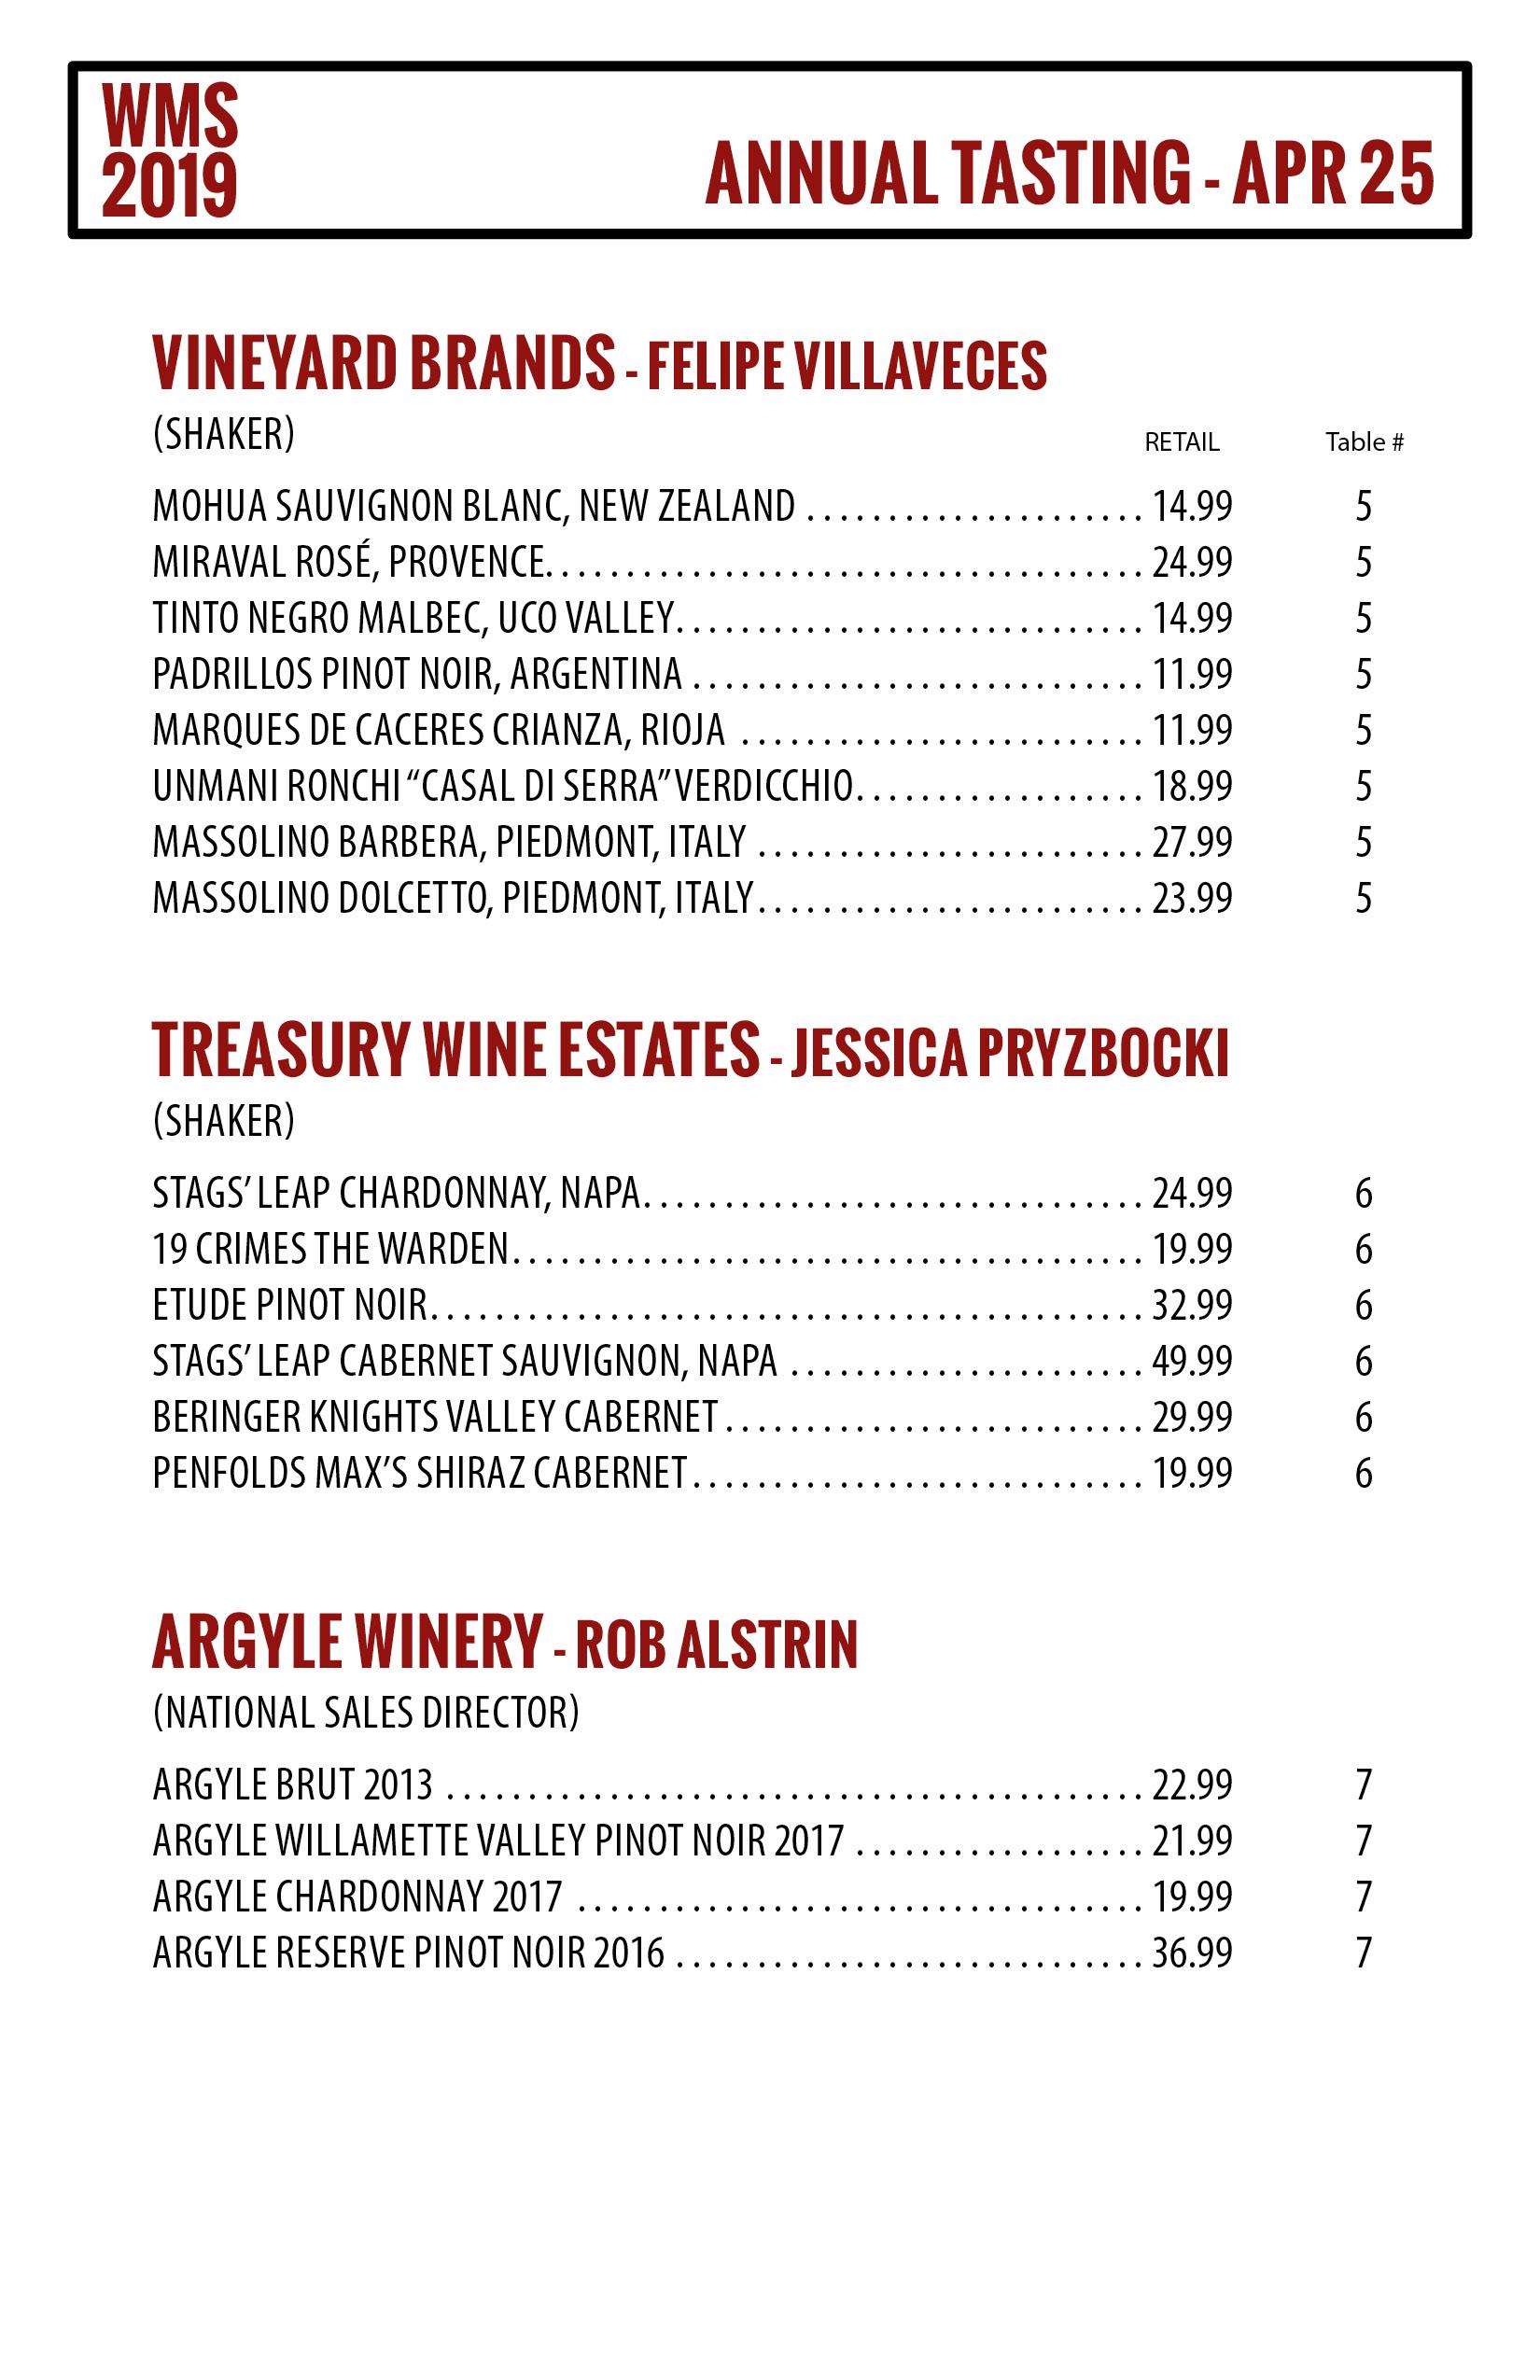 Winemakers and Shakers_Tasting Guide_20194.jpg